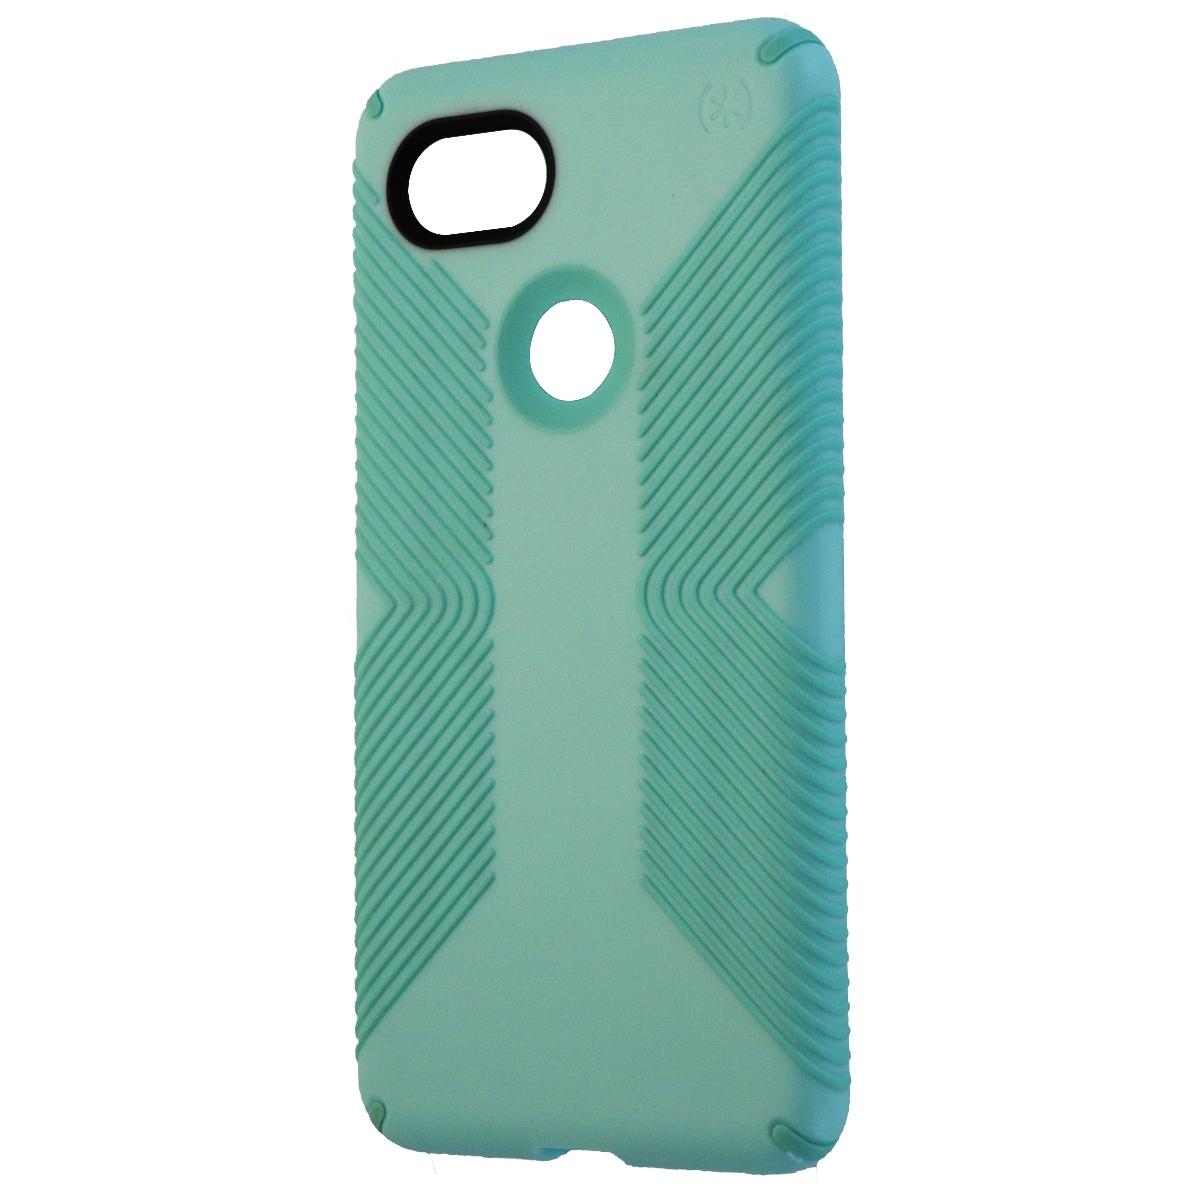 Speck Presidio Grip Series Hybrid Hard Case Cover for Google Pixel 2 XL - Teal